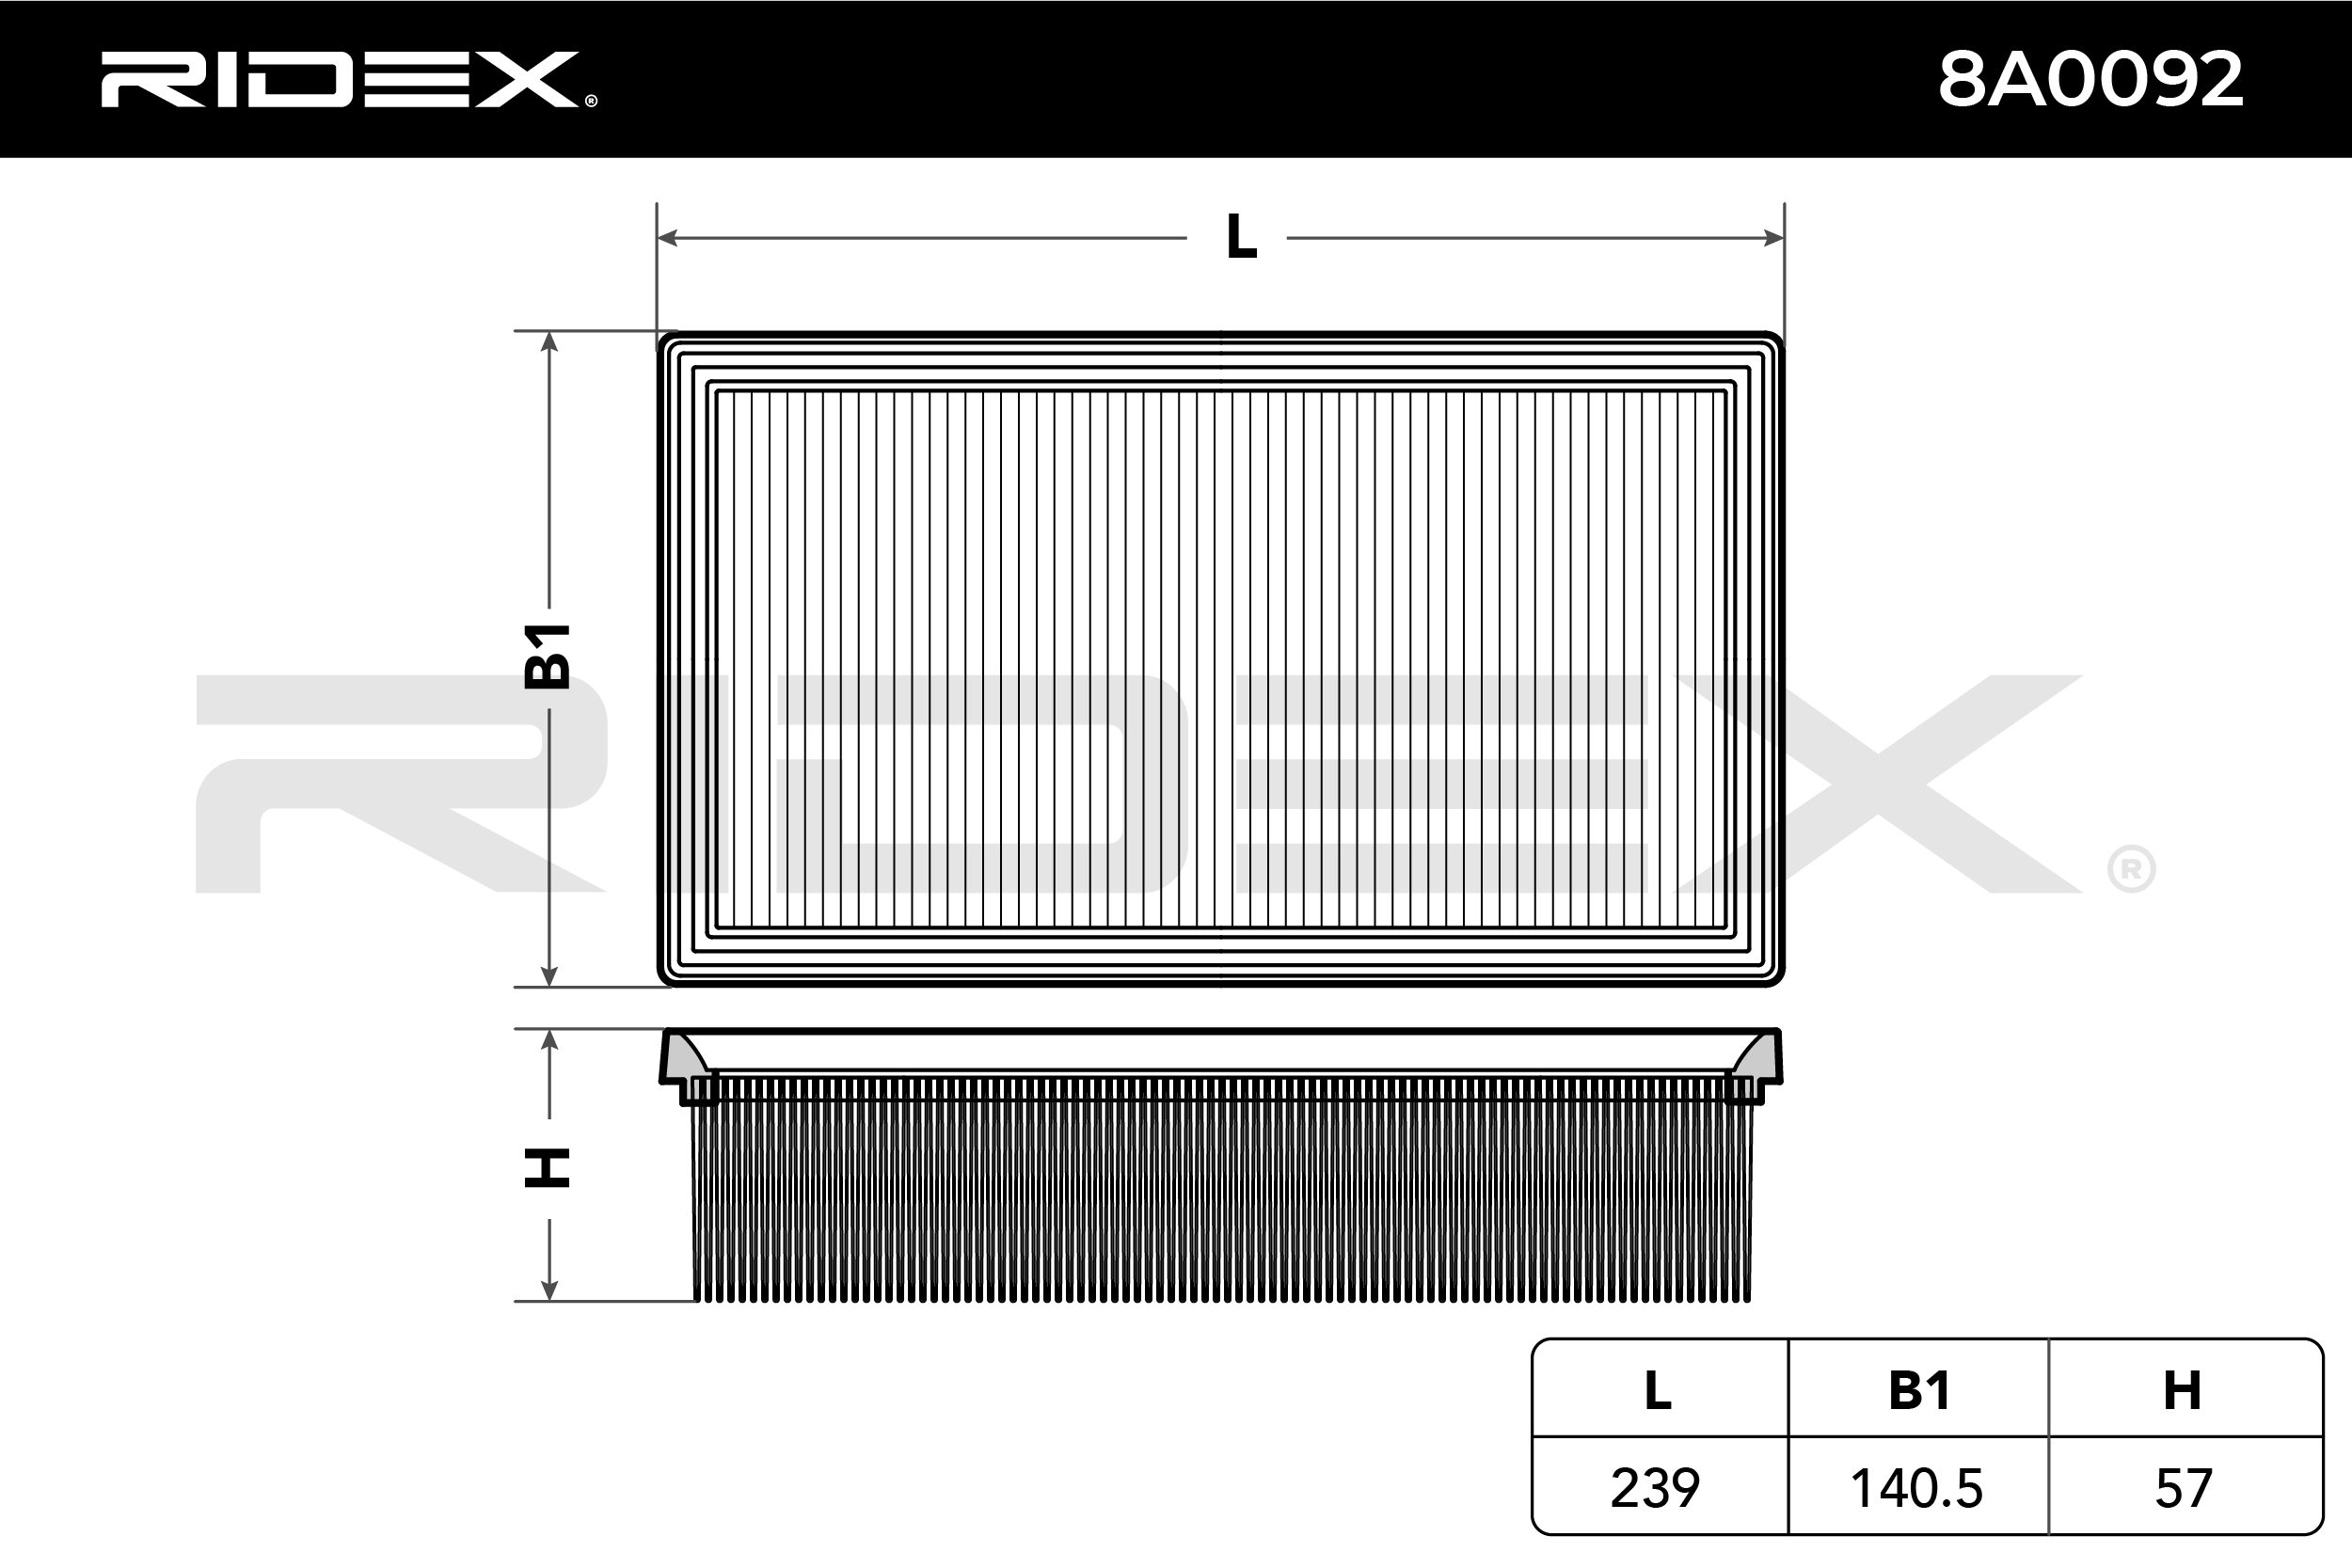 RIDEX Art. Nr 8A0092 günstig